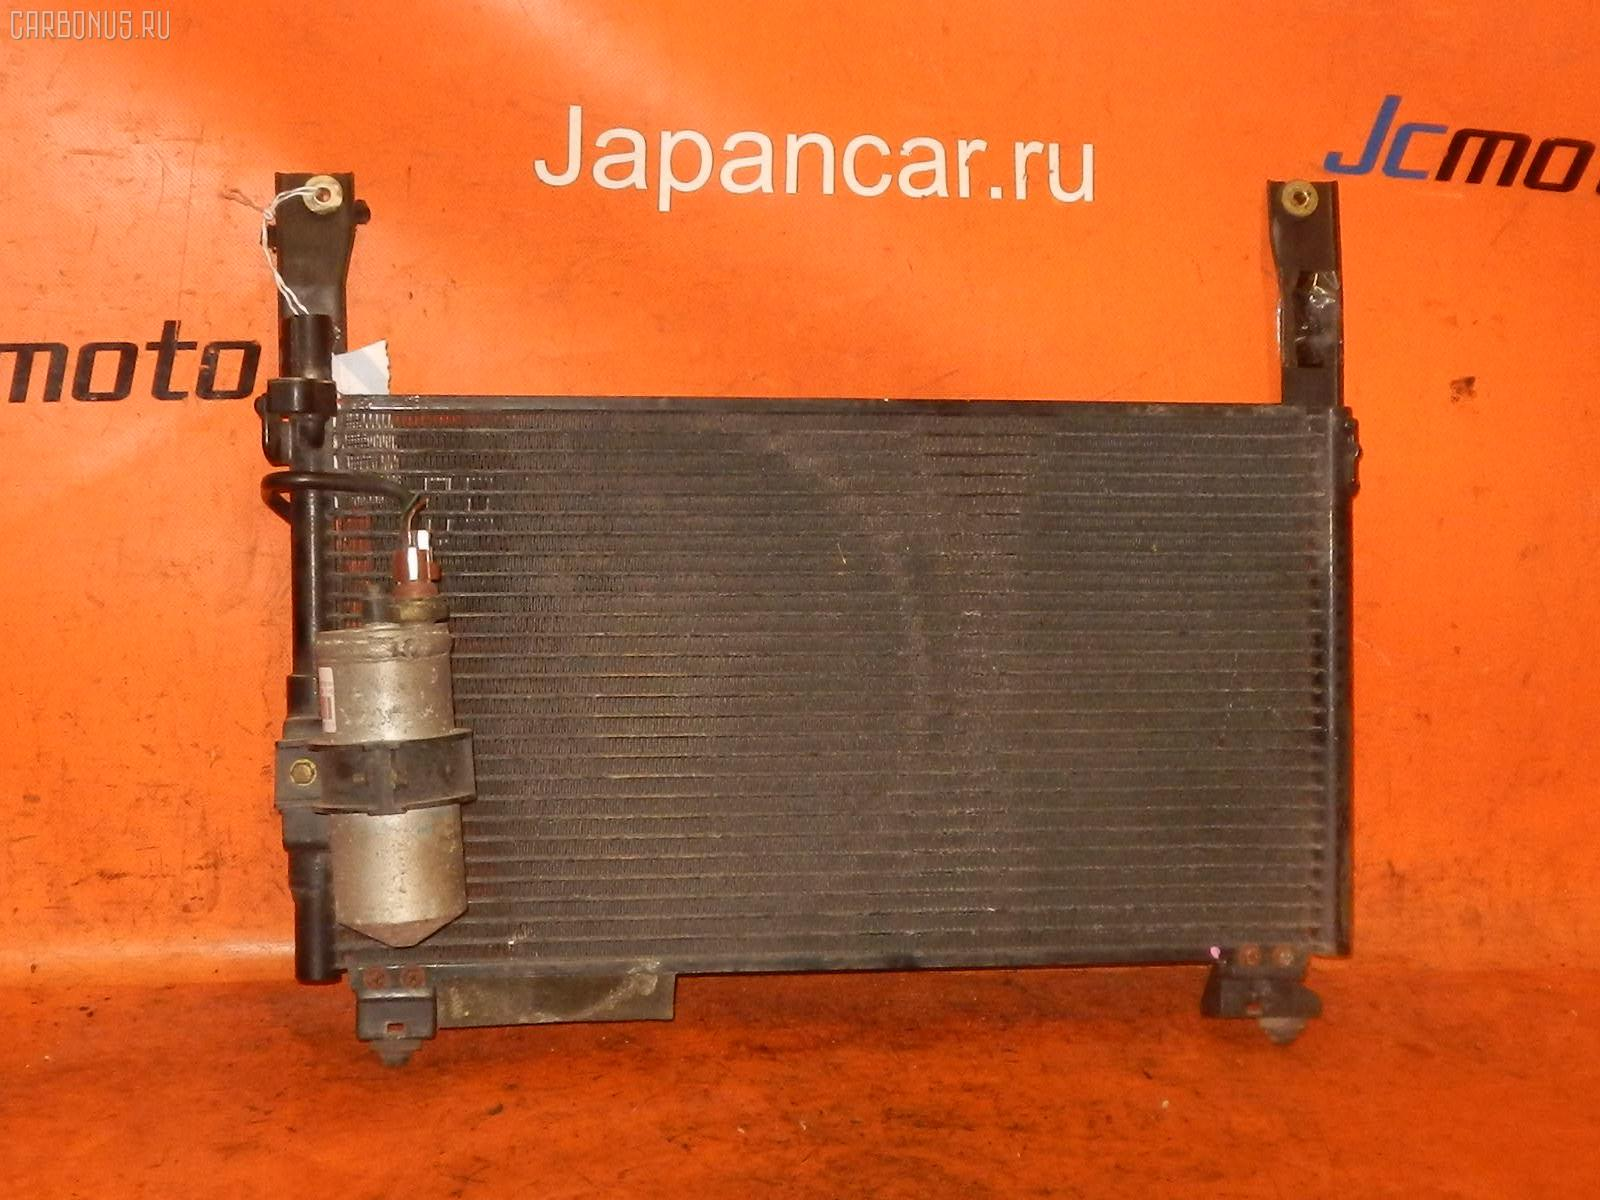 Радиатор кондиционера MITSUBISHI PAJERO JUNIOR H57A 4A31 Фото 1